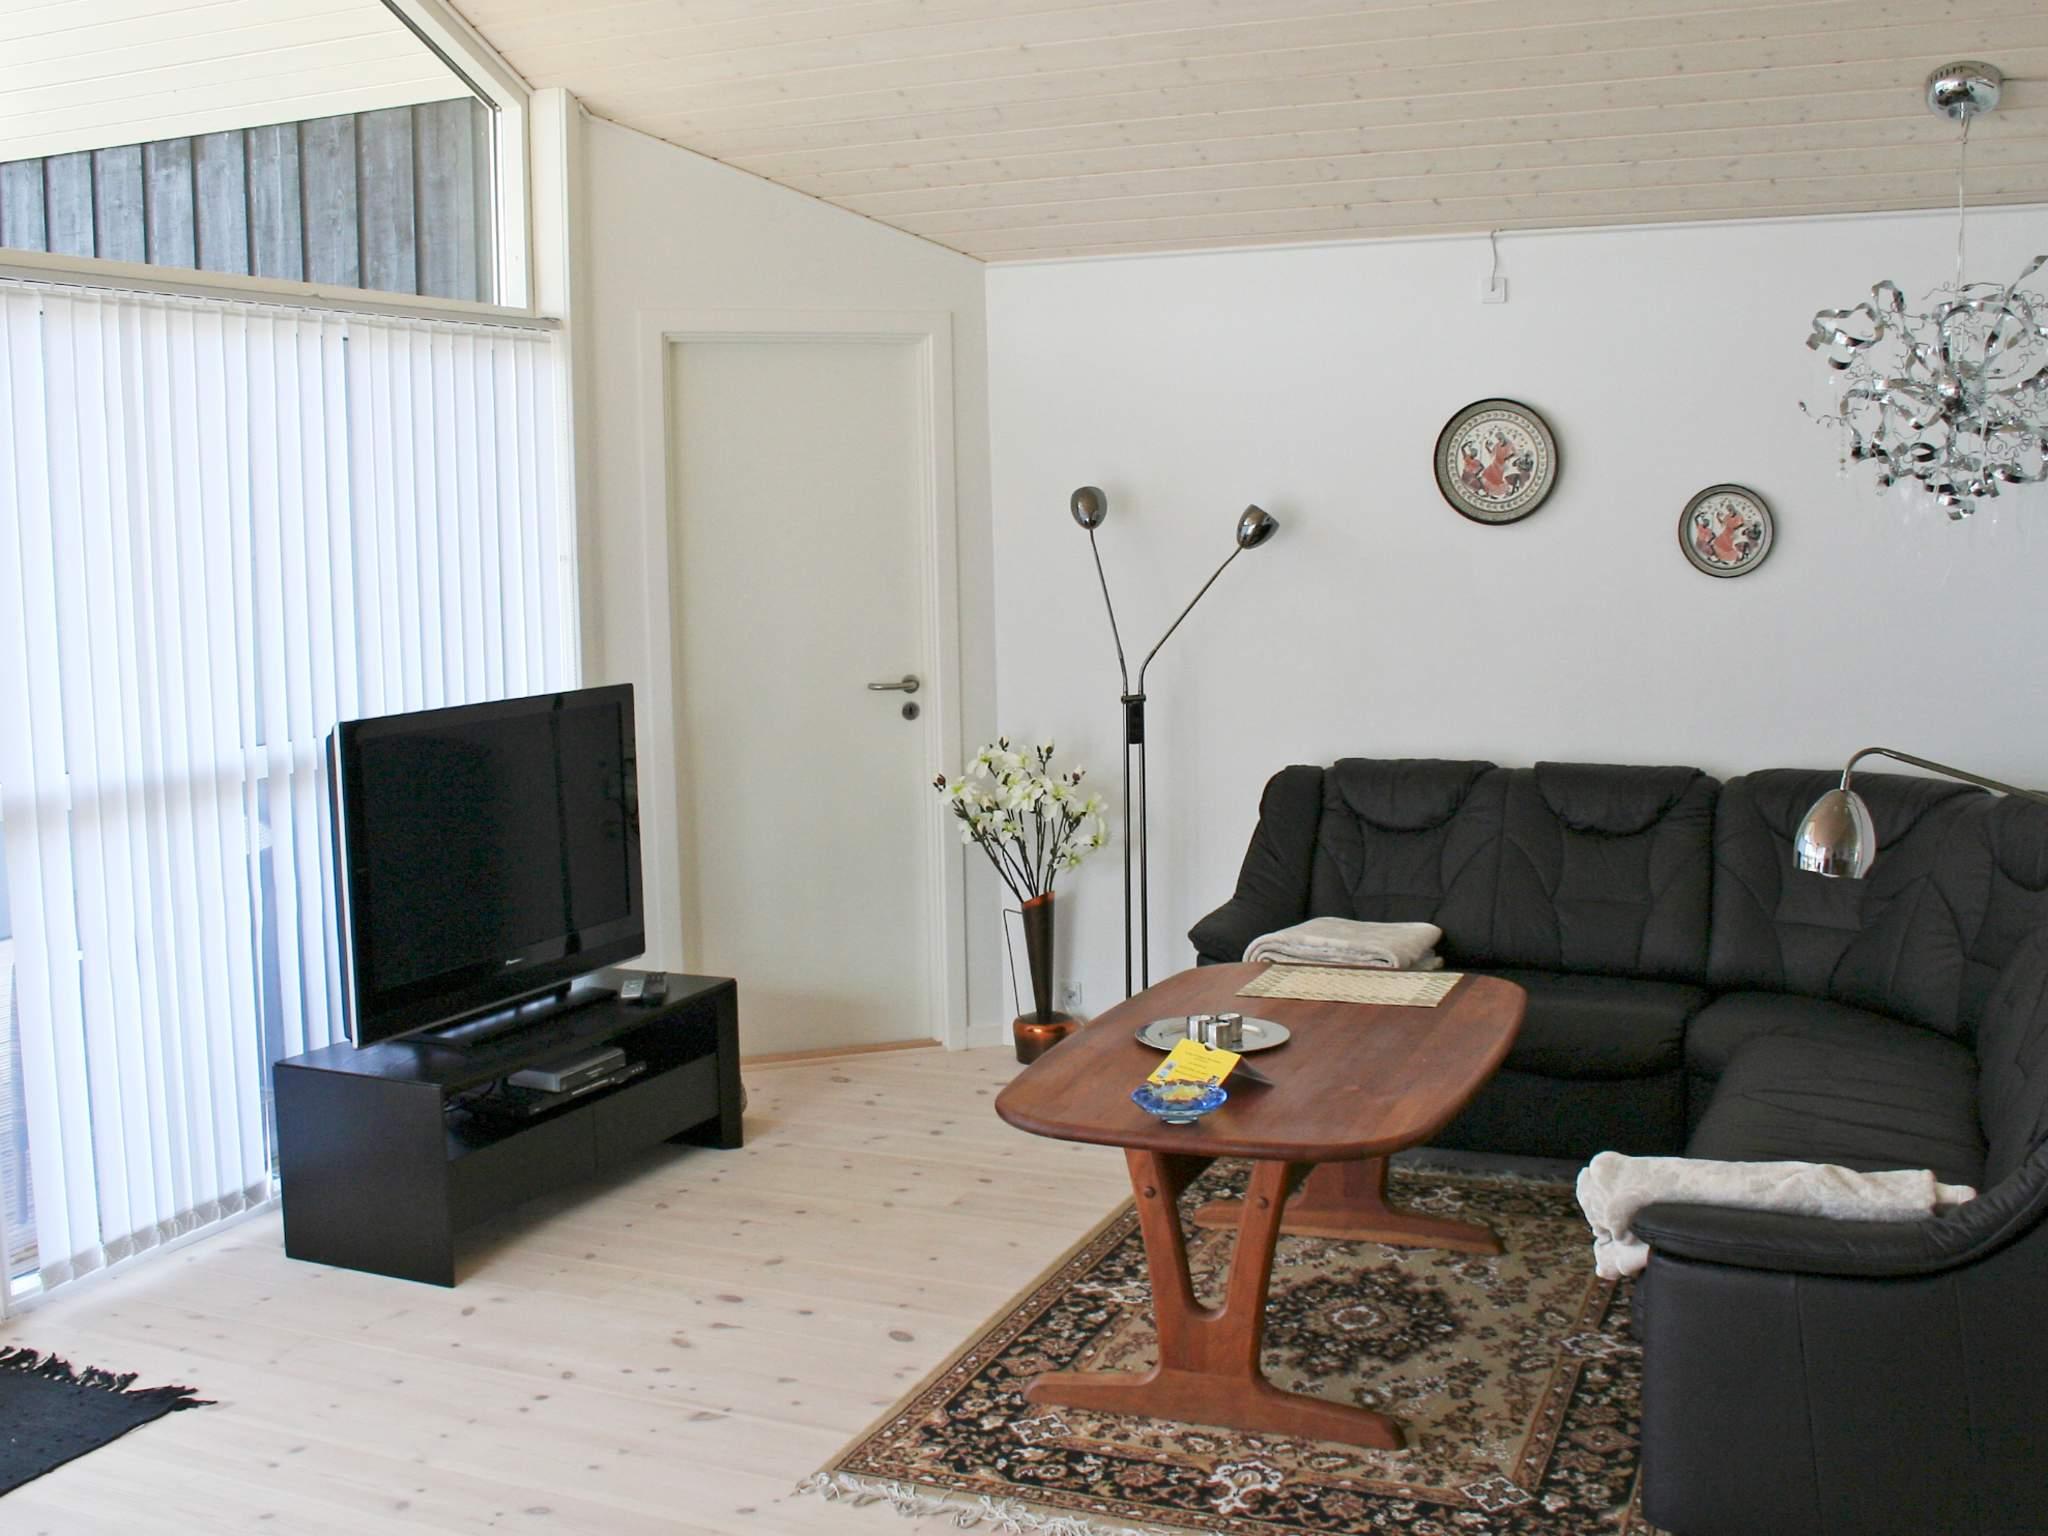 Ferienhaus Balka Strand (334426), Balke, , Bornholm, Dänemark, Bild 2